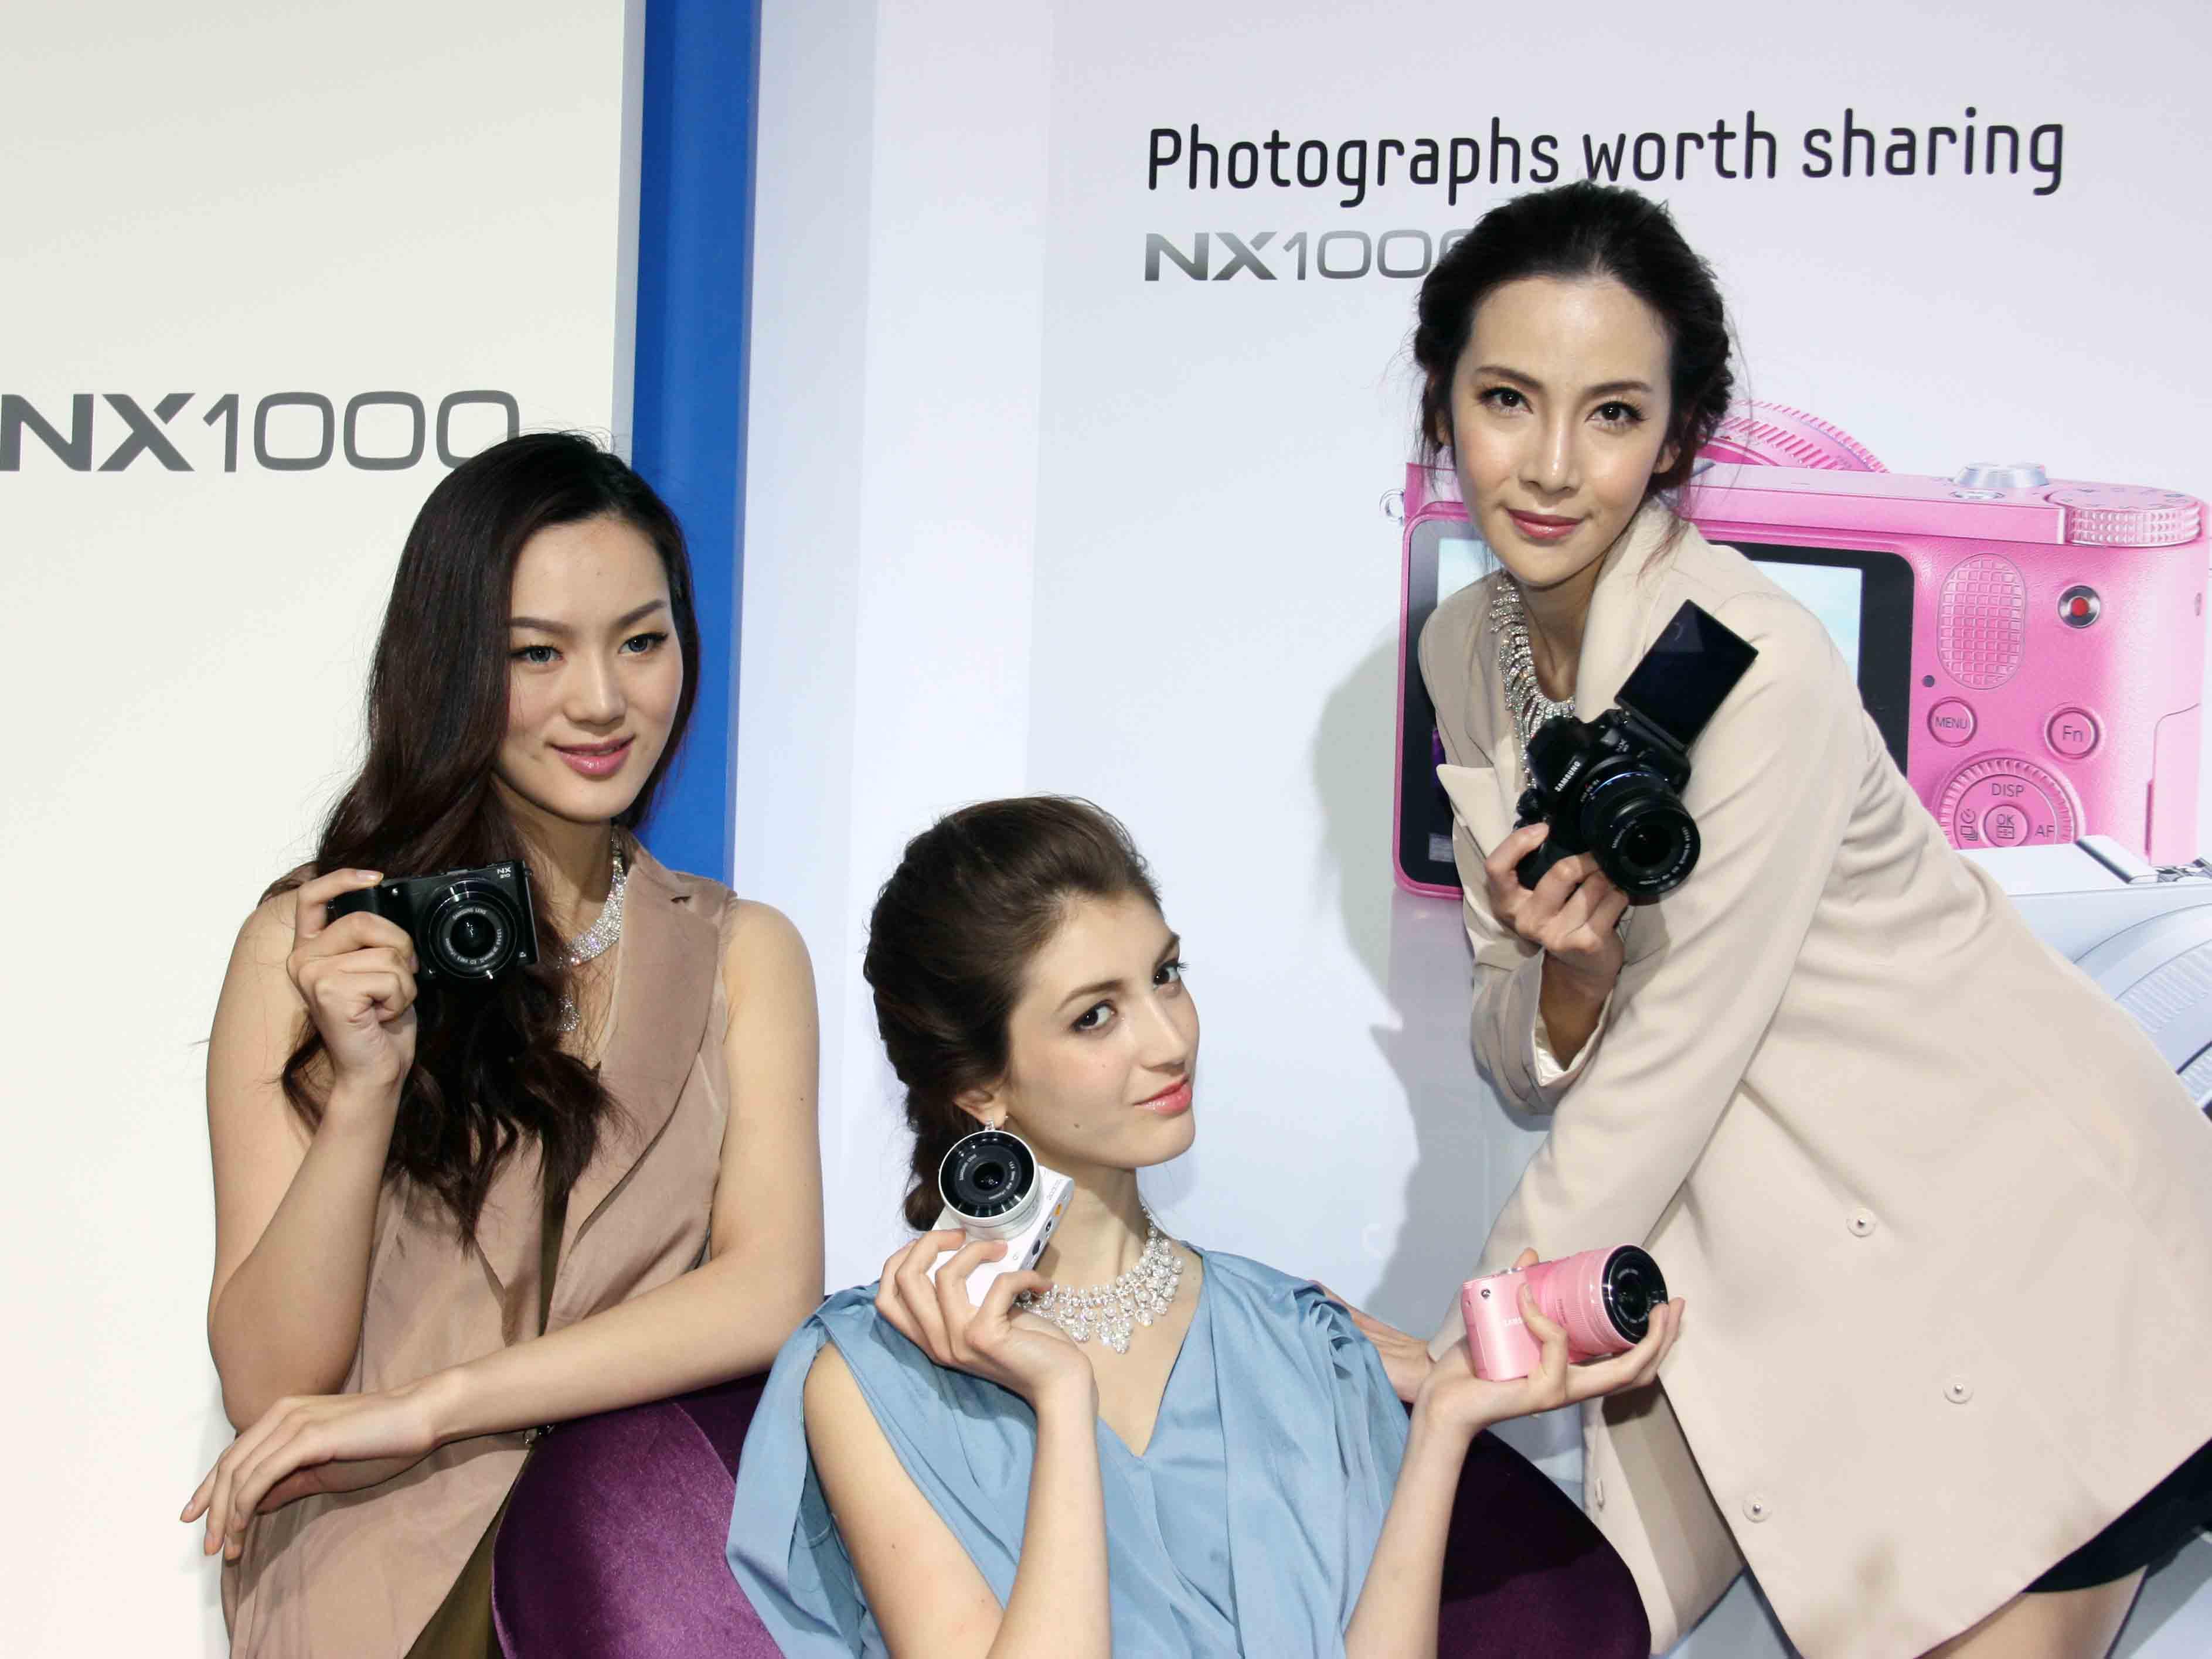 Samsung 發表三款 NX 可交換鏡頭相機,都有 Wi-Fi 功能